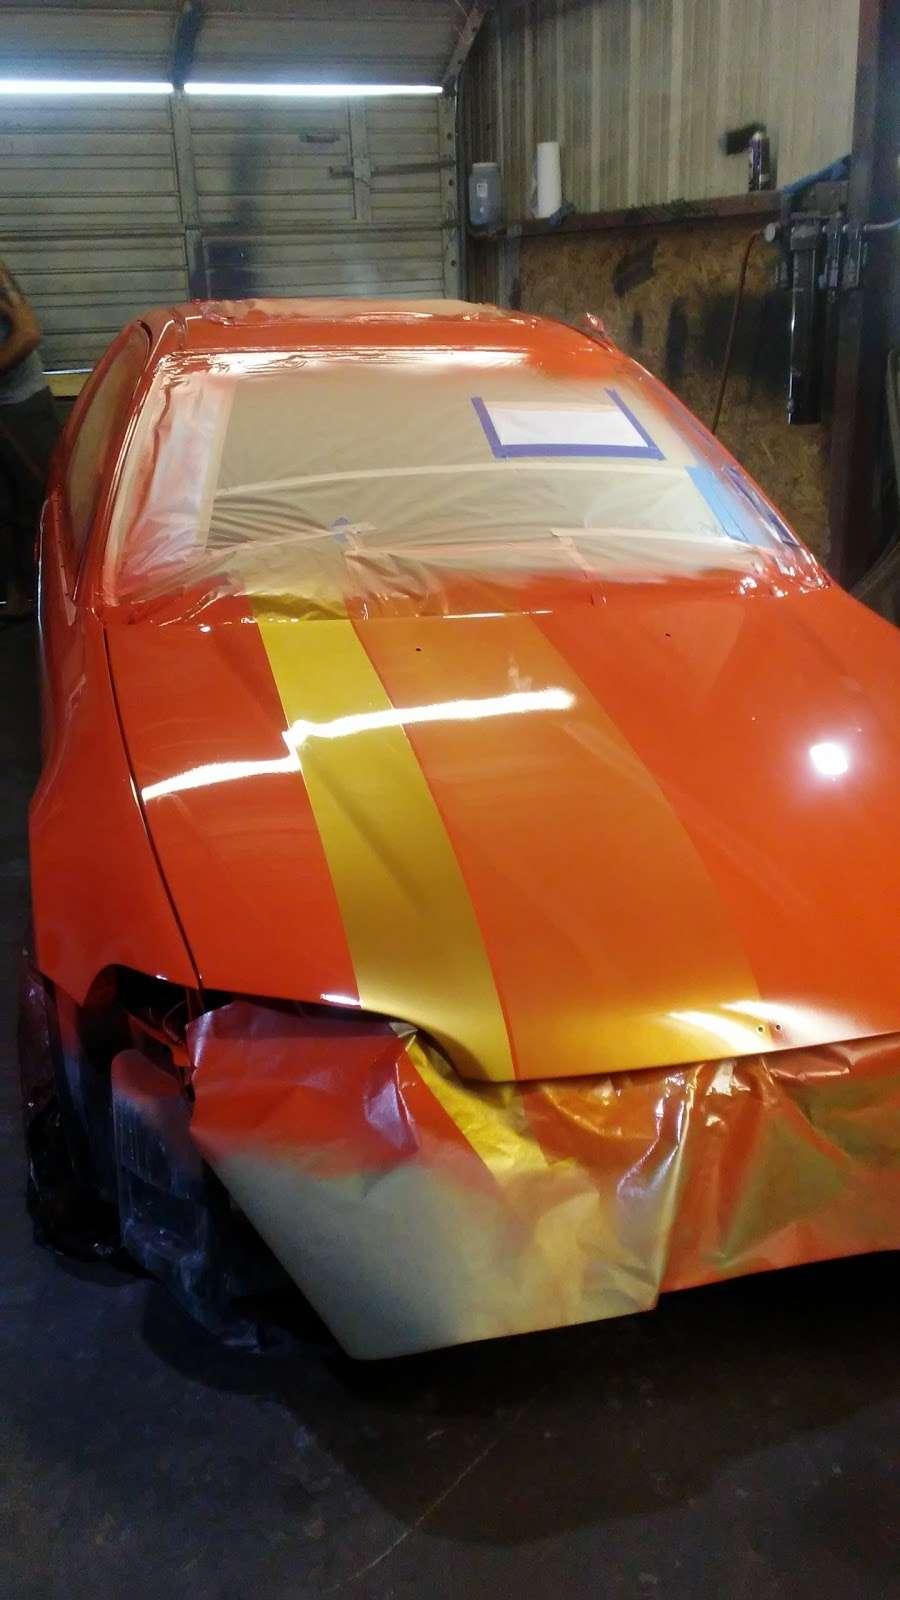 Merlin Automotive - car repair  | Photo 2 of 10 | Address: 216 FM78, Schertz, TX 78154, USA | Phone: (210) 945-8993